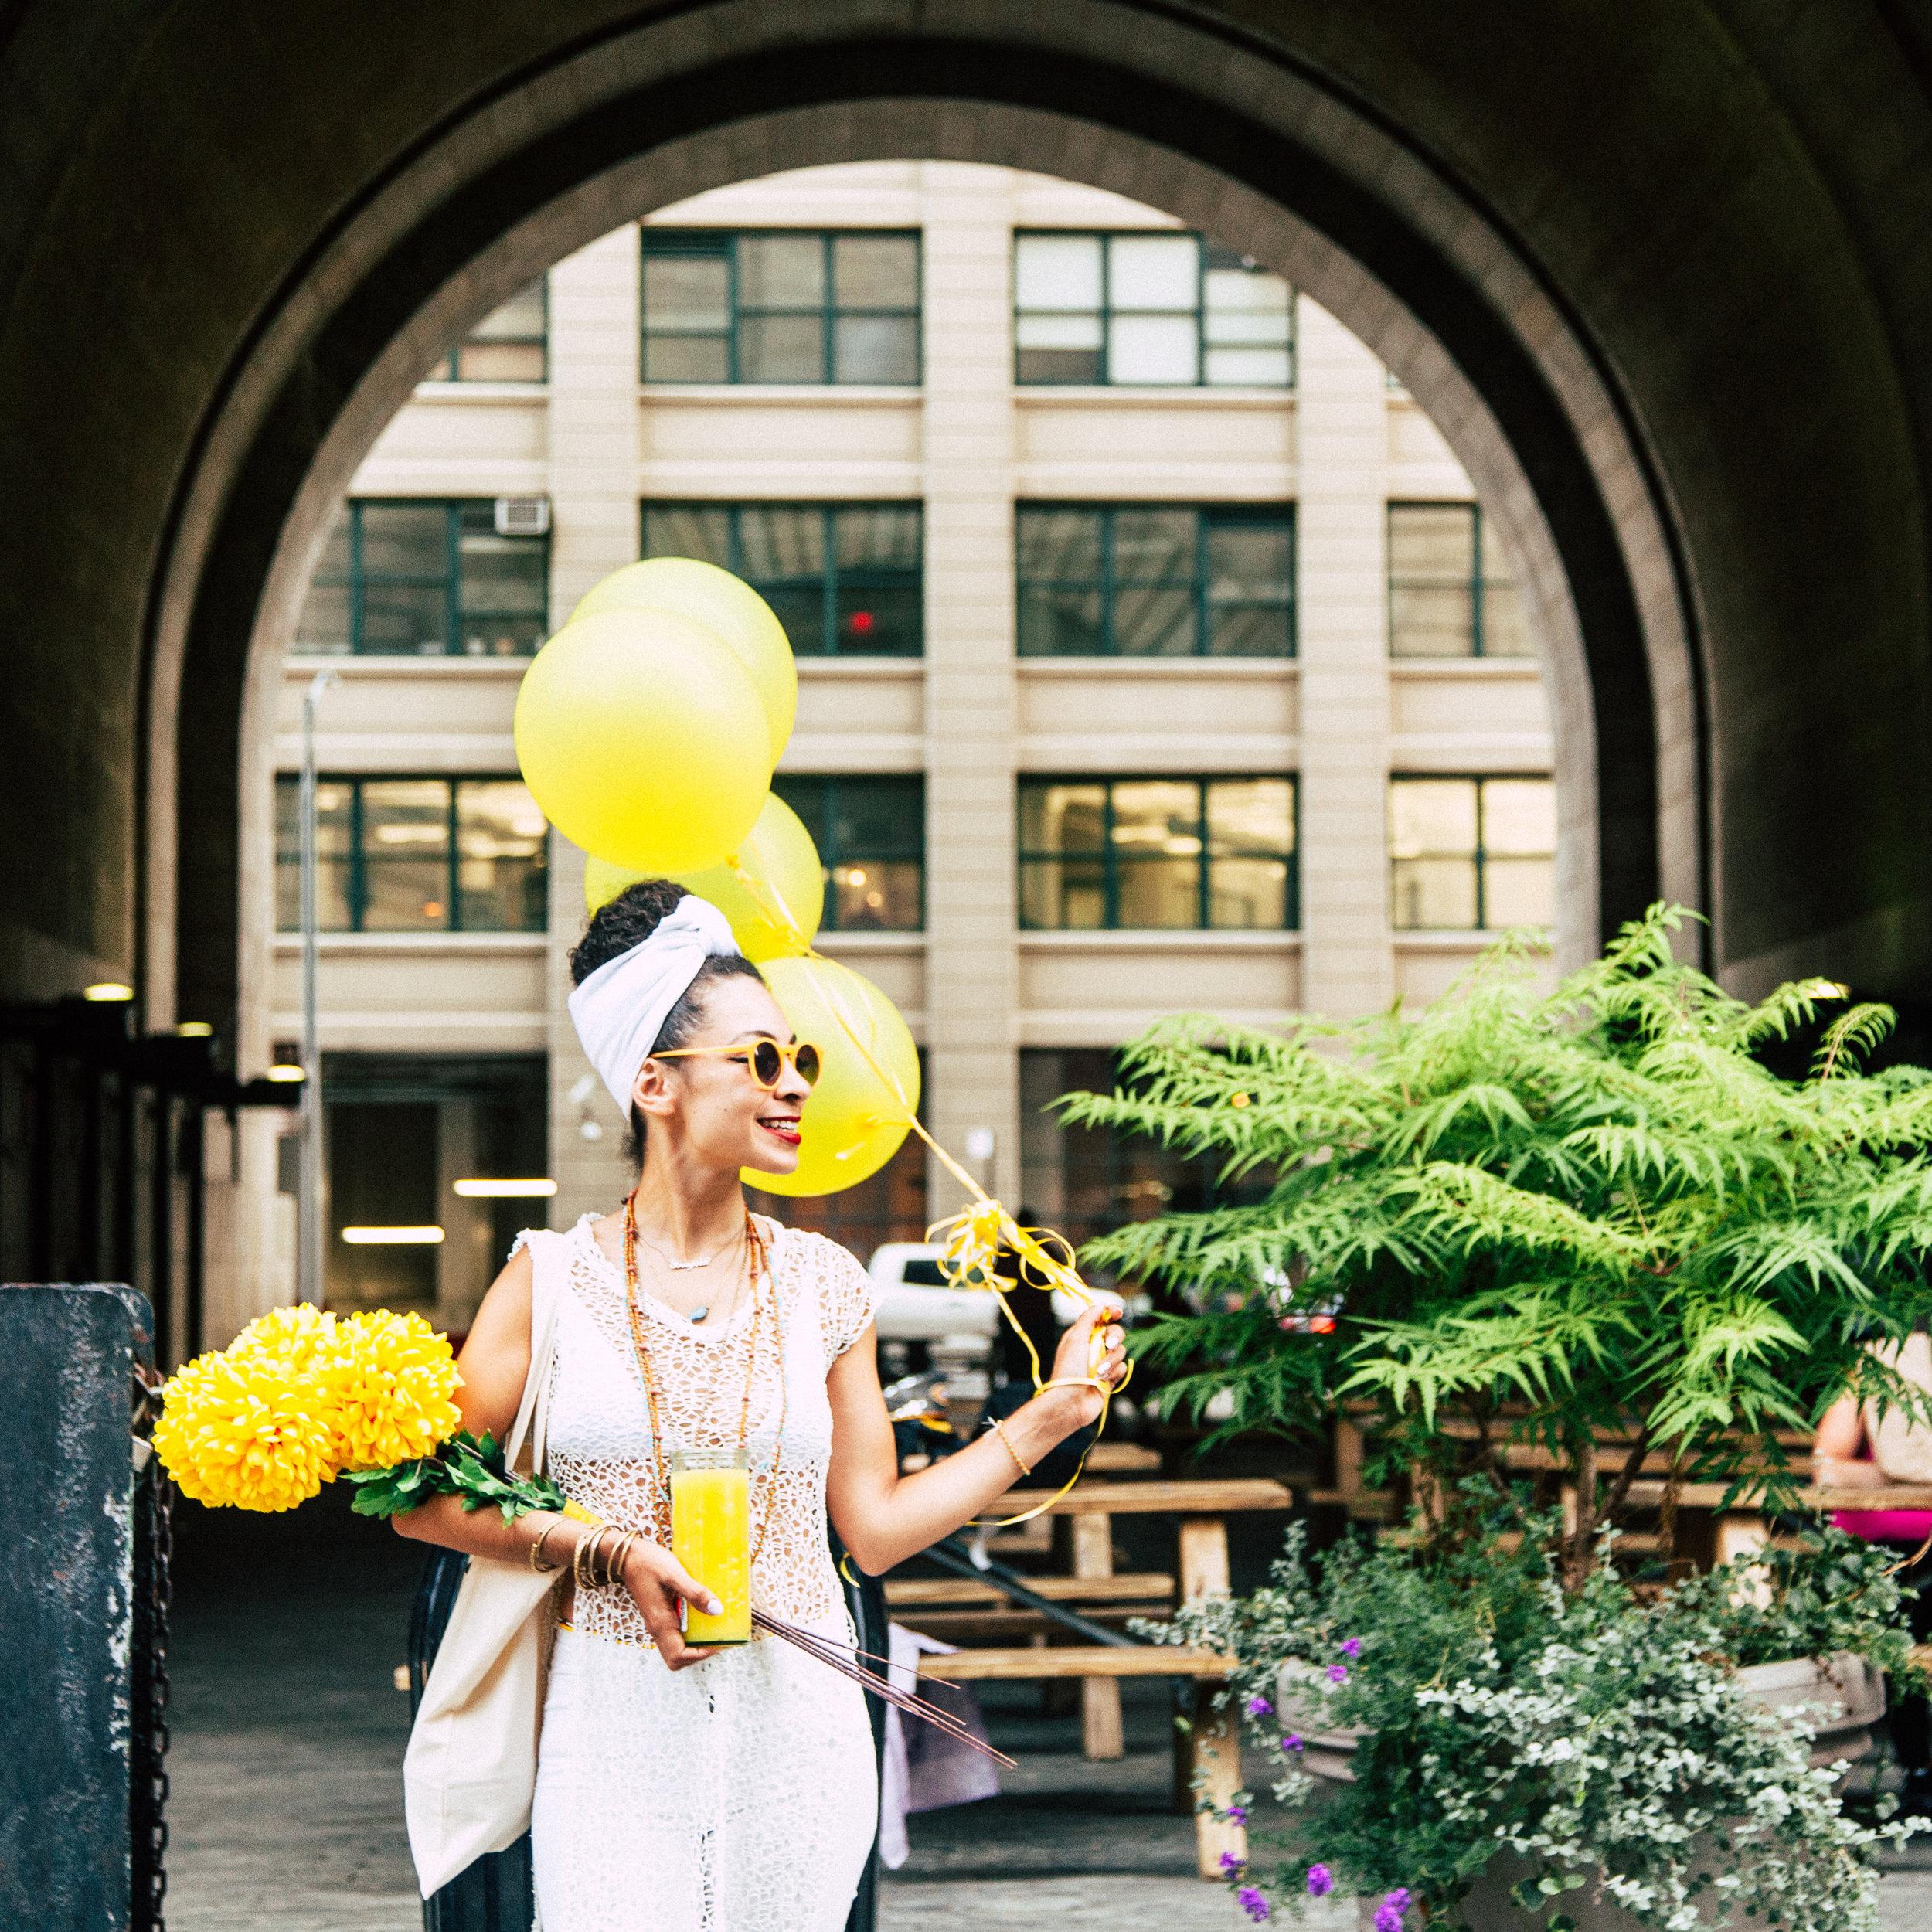 Chiquita Brujita // Philanthropist // Circus Wrangler // Fiesta manifester